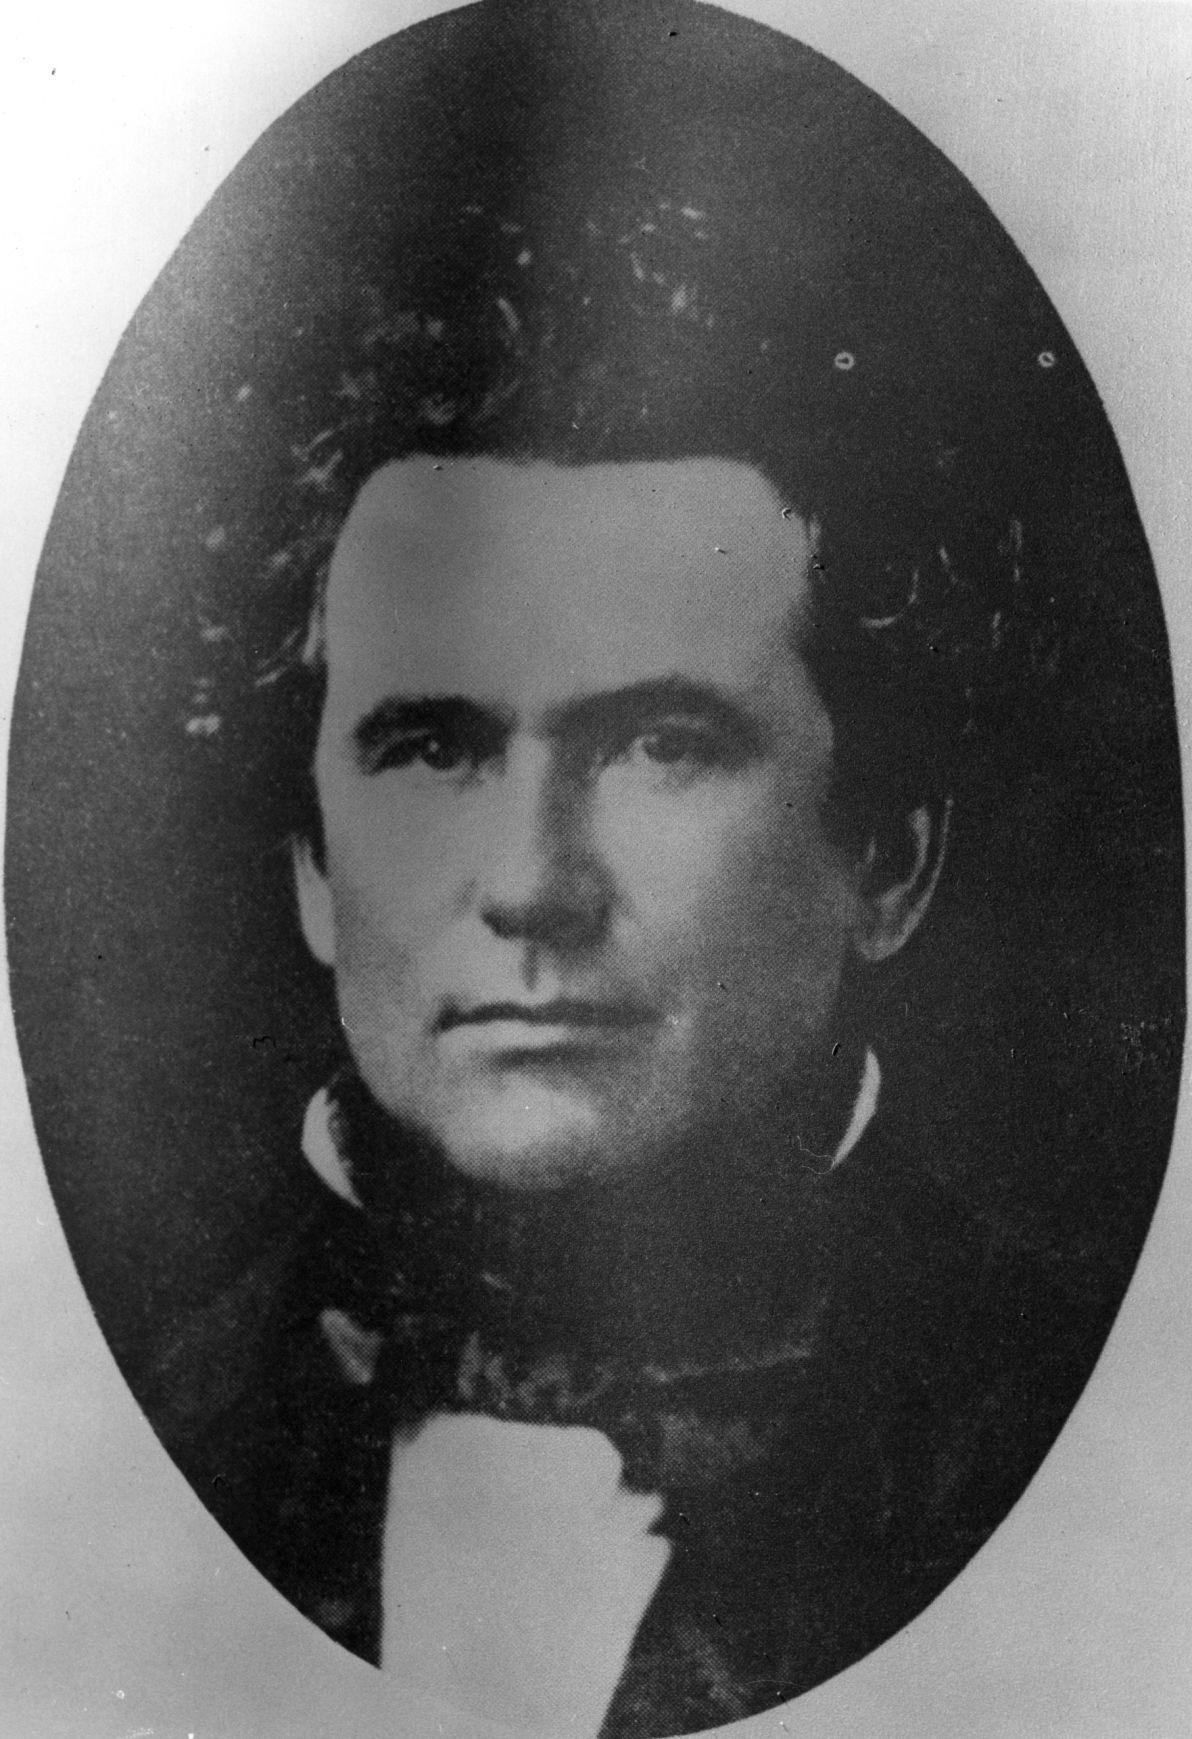 Francis Pierpont